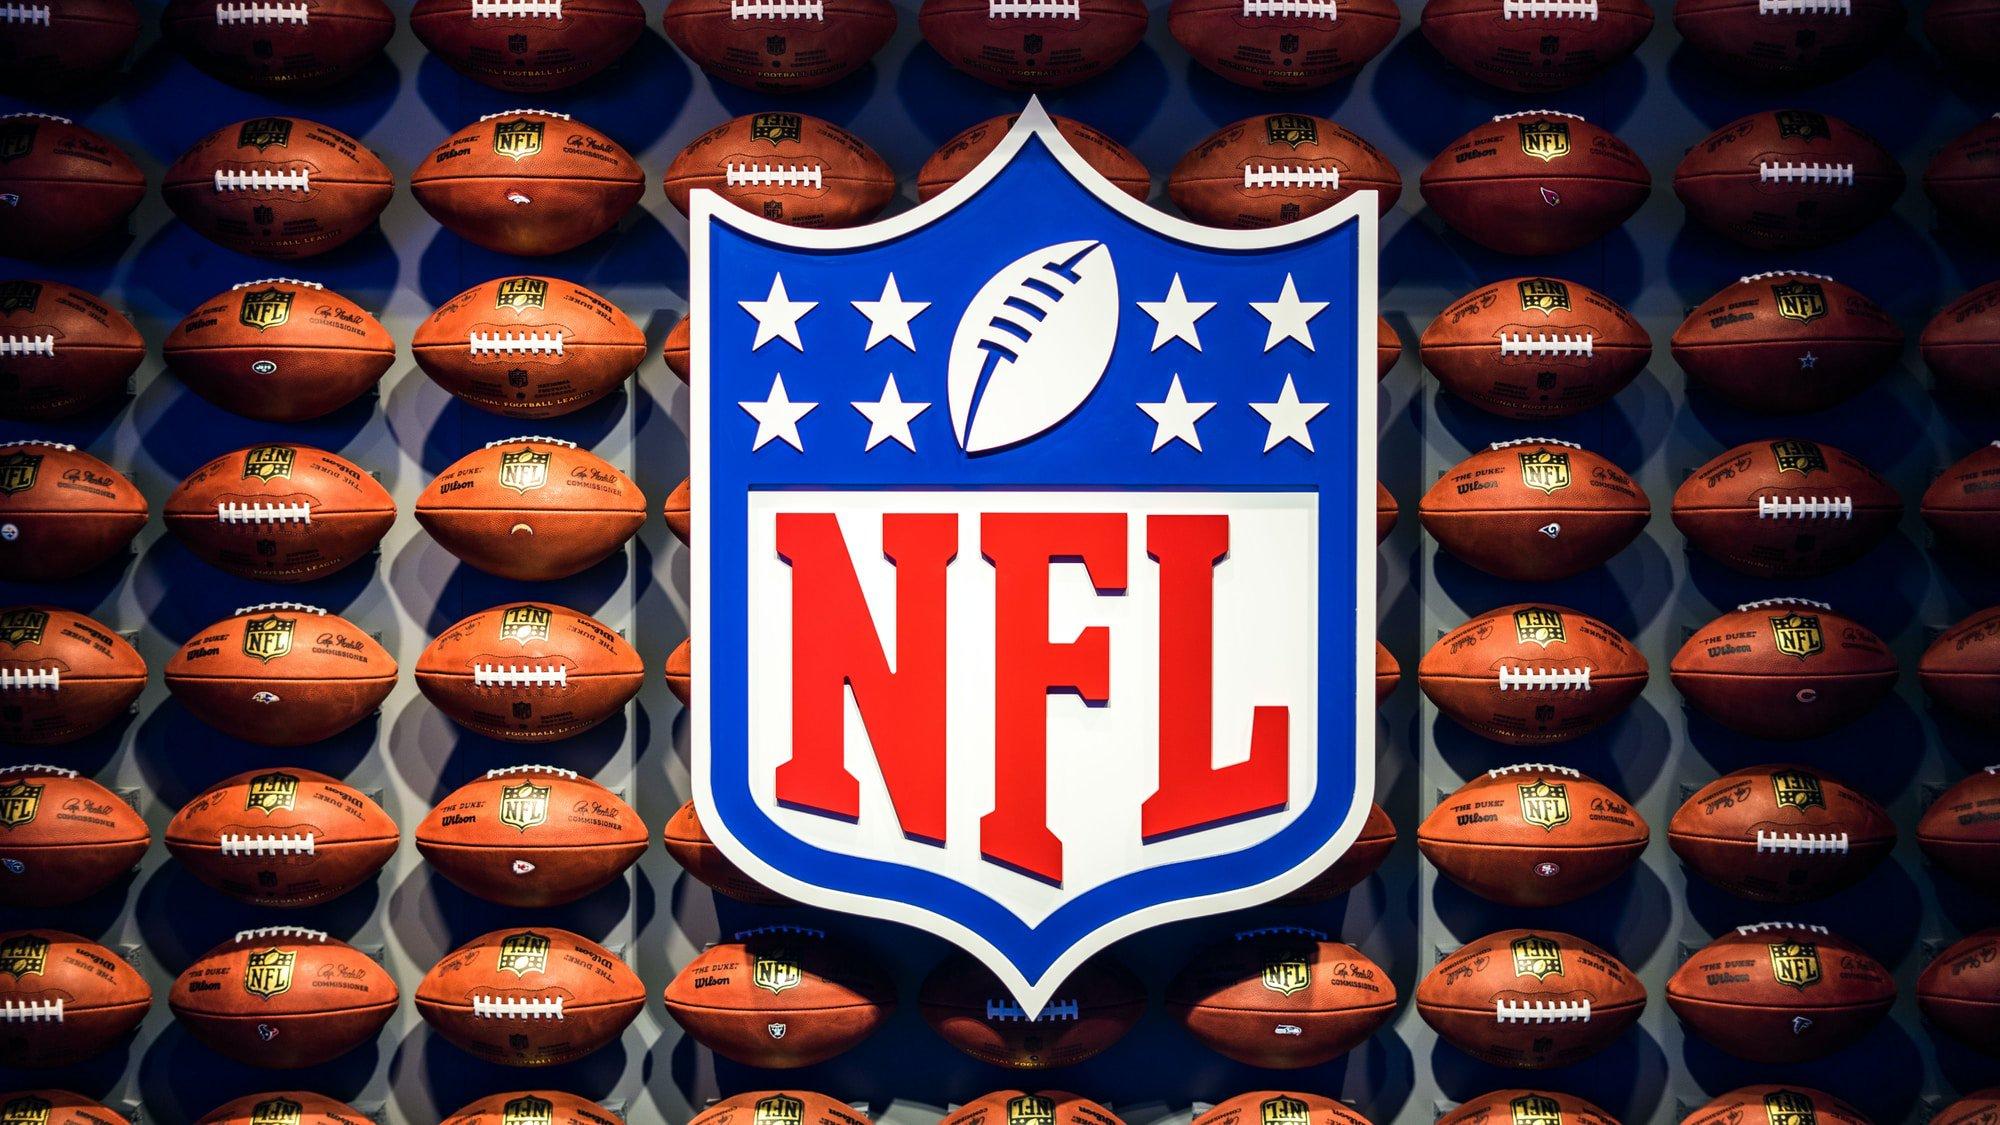 2021 NFL MVP Odds: Patrick Mahomes Favored Ahead of New Season